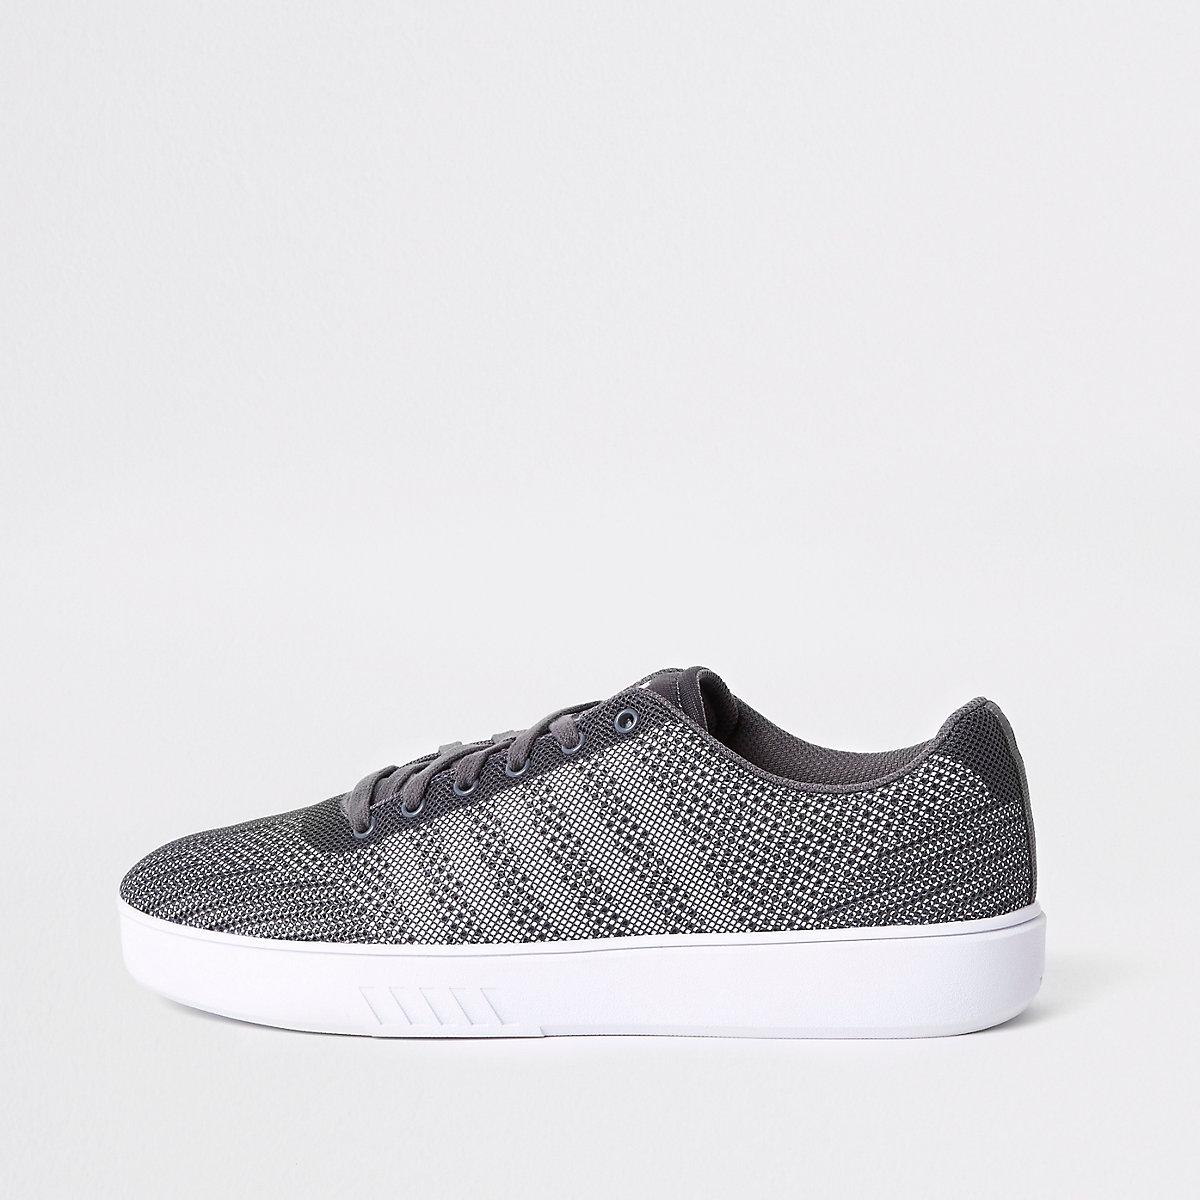 K-Swiss grey mesh sneakers